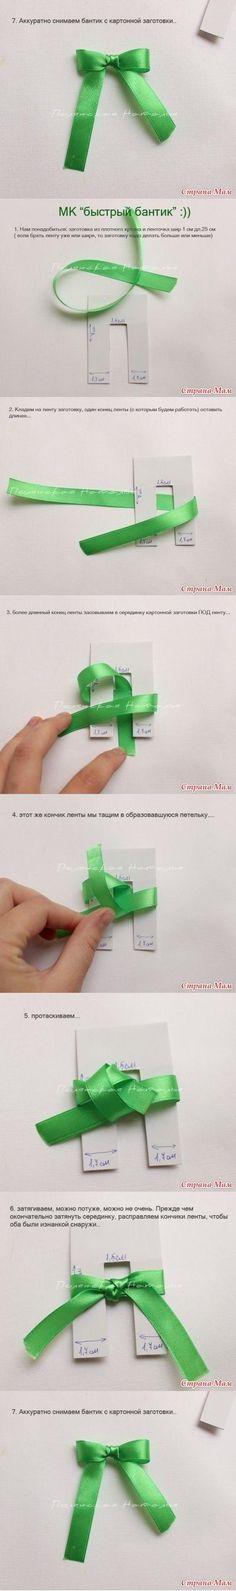 DIY Easy Ribbon Bow DIY Easy Ribbon Bow